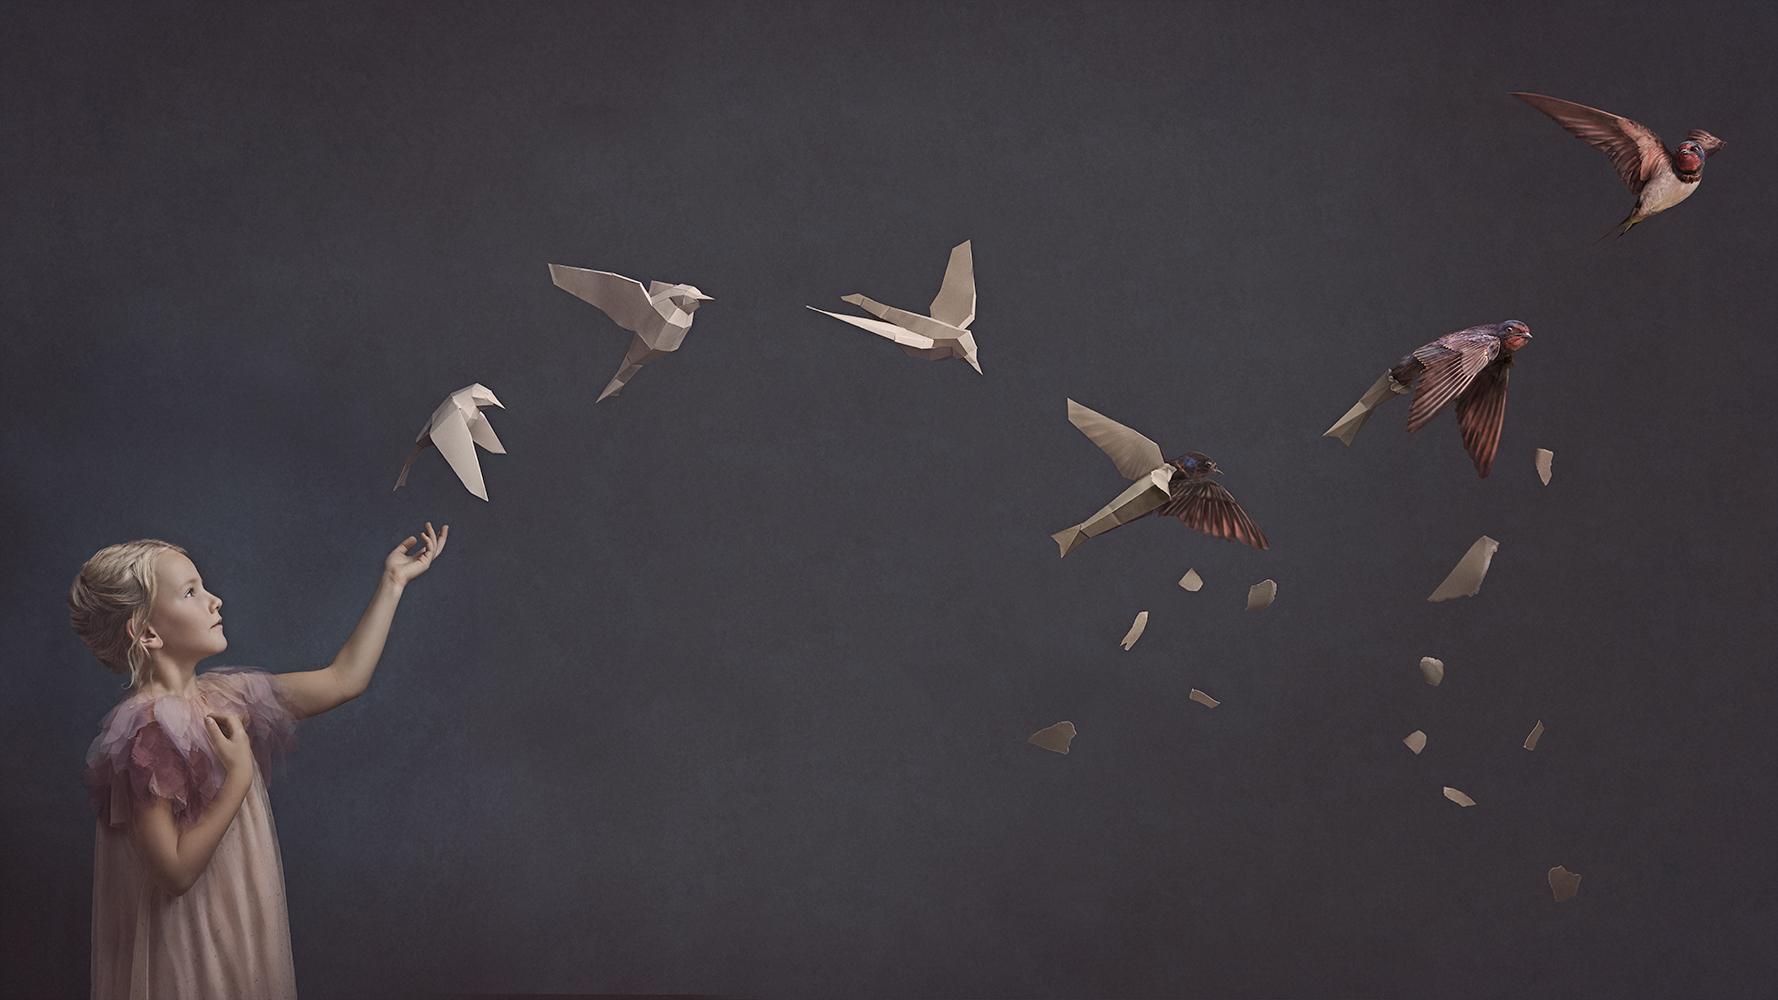 Cora&Birds_plate_7_lowres.jpg